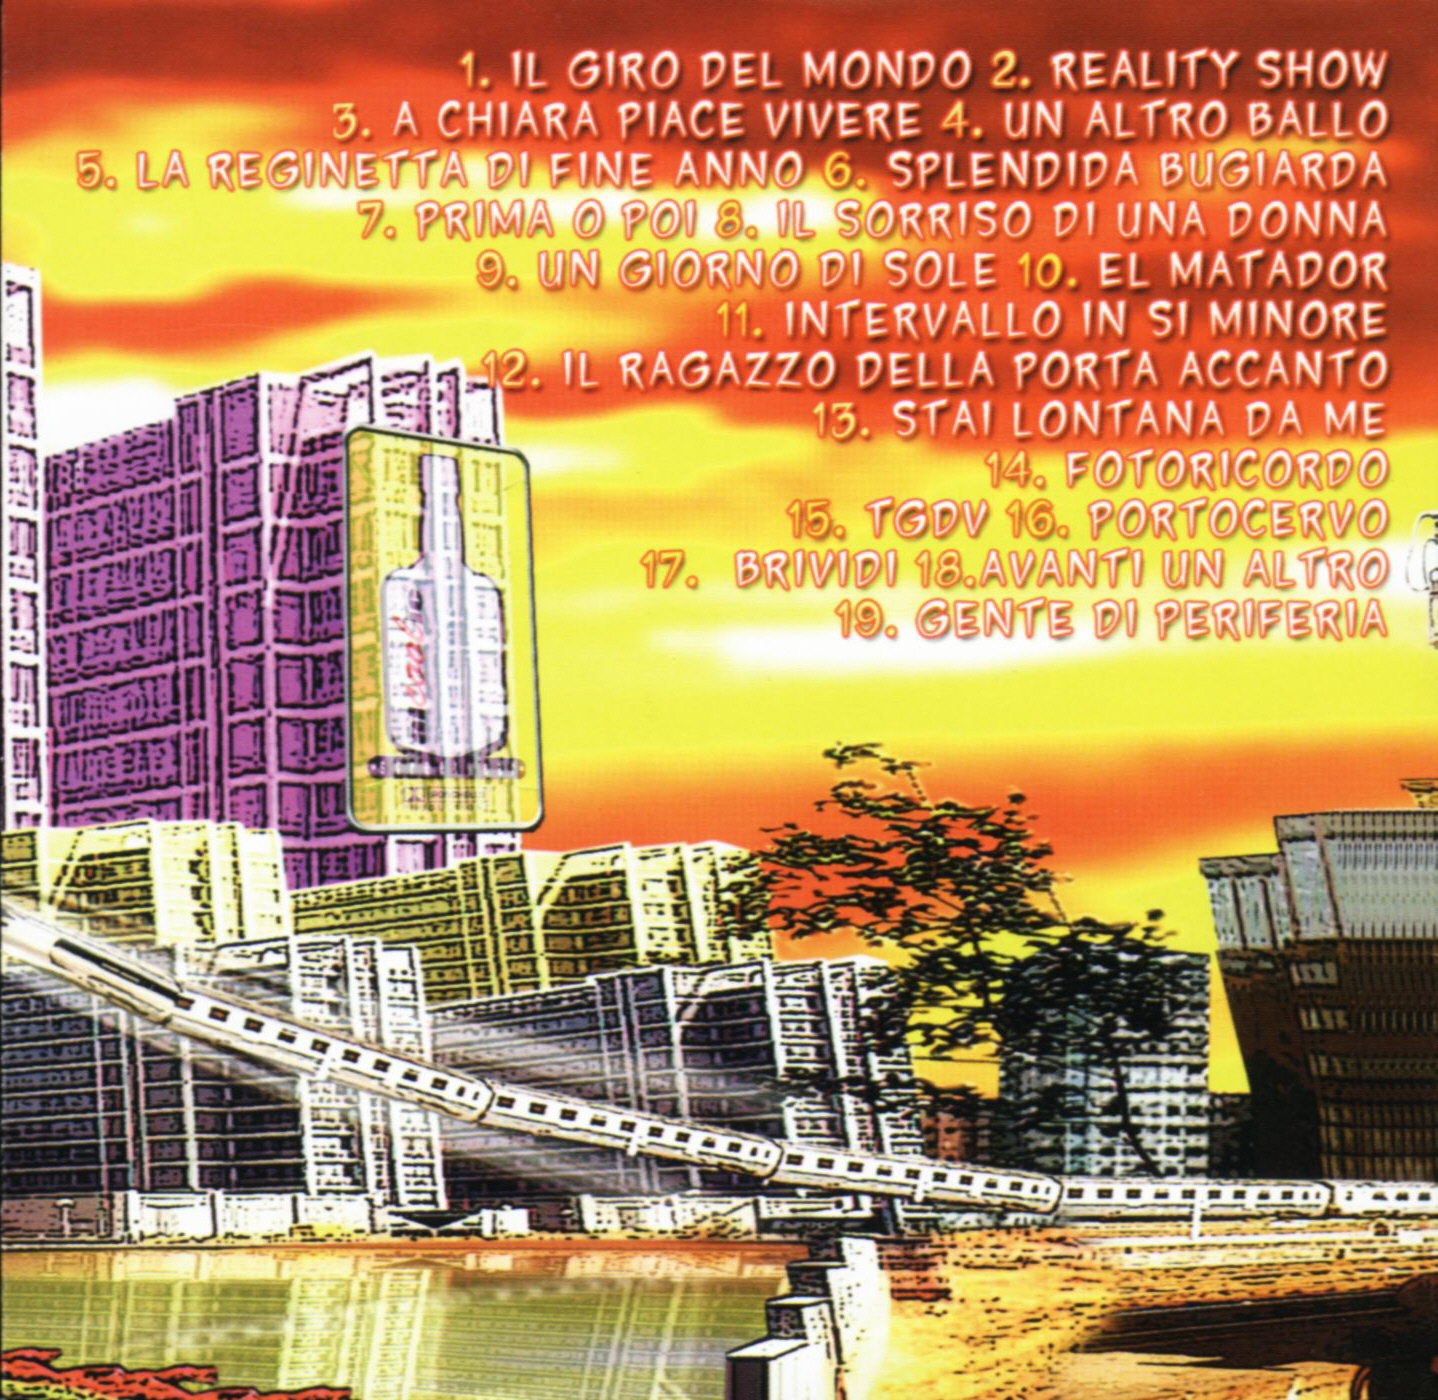 Copertina cd gemelli diversi reality show inside - Reality show gemelli diversi ...